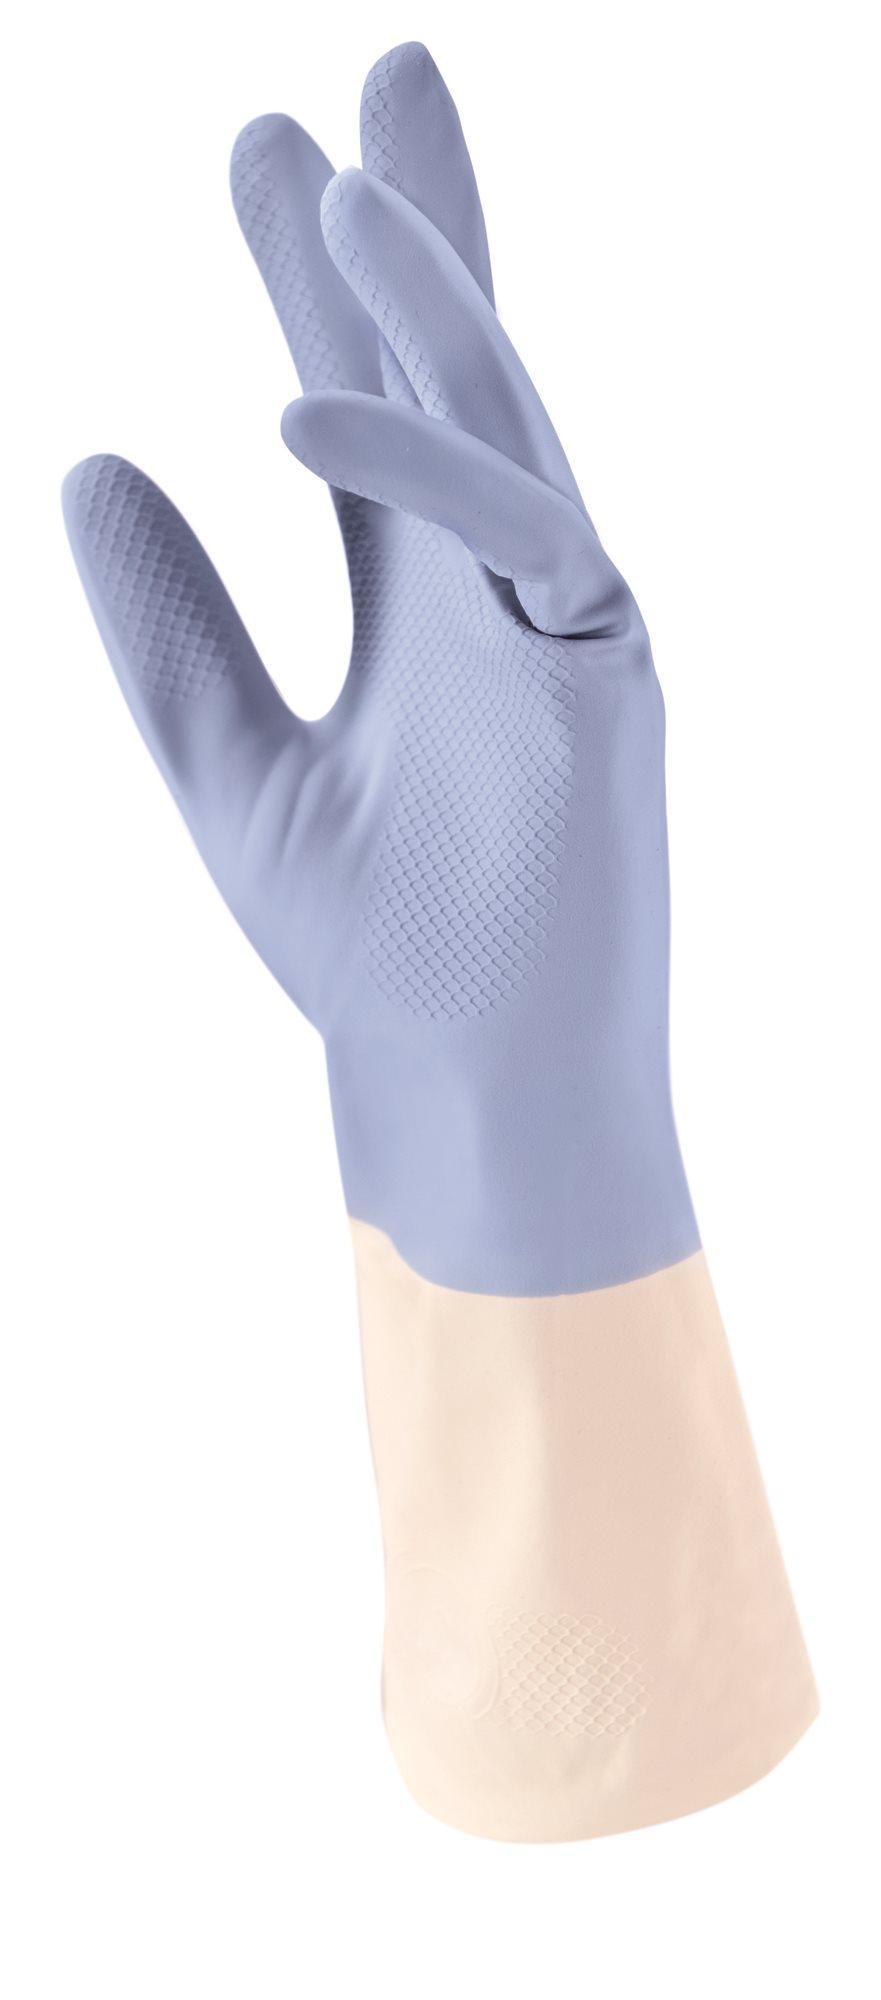 Tescoma Γάντια Lattex με Βαμβακερή Επίστρωση & Αλόη Profimate Large